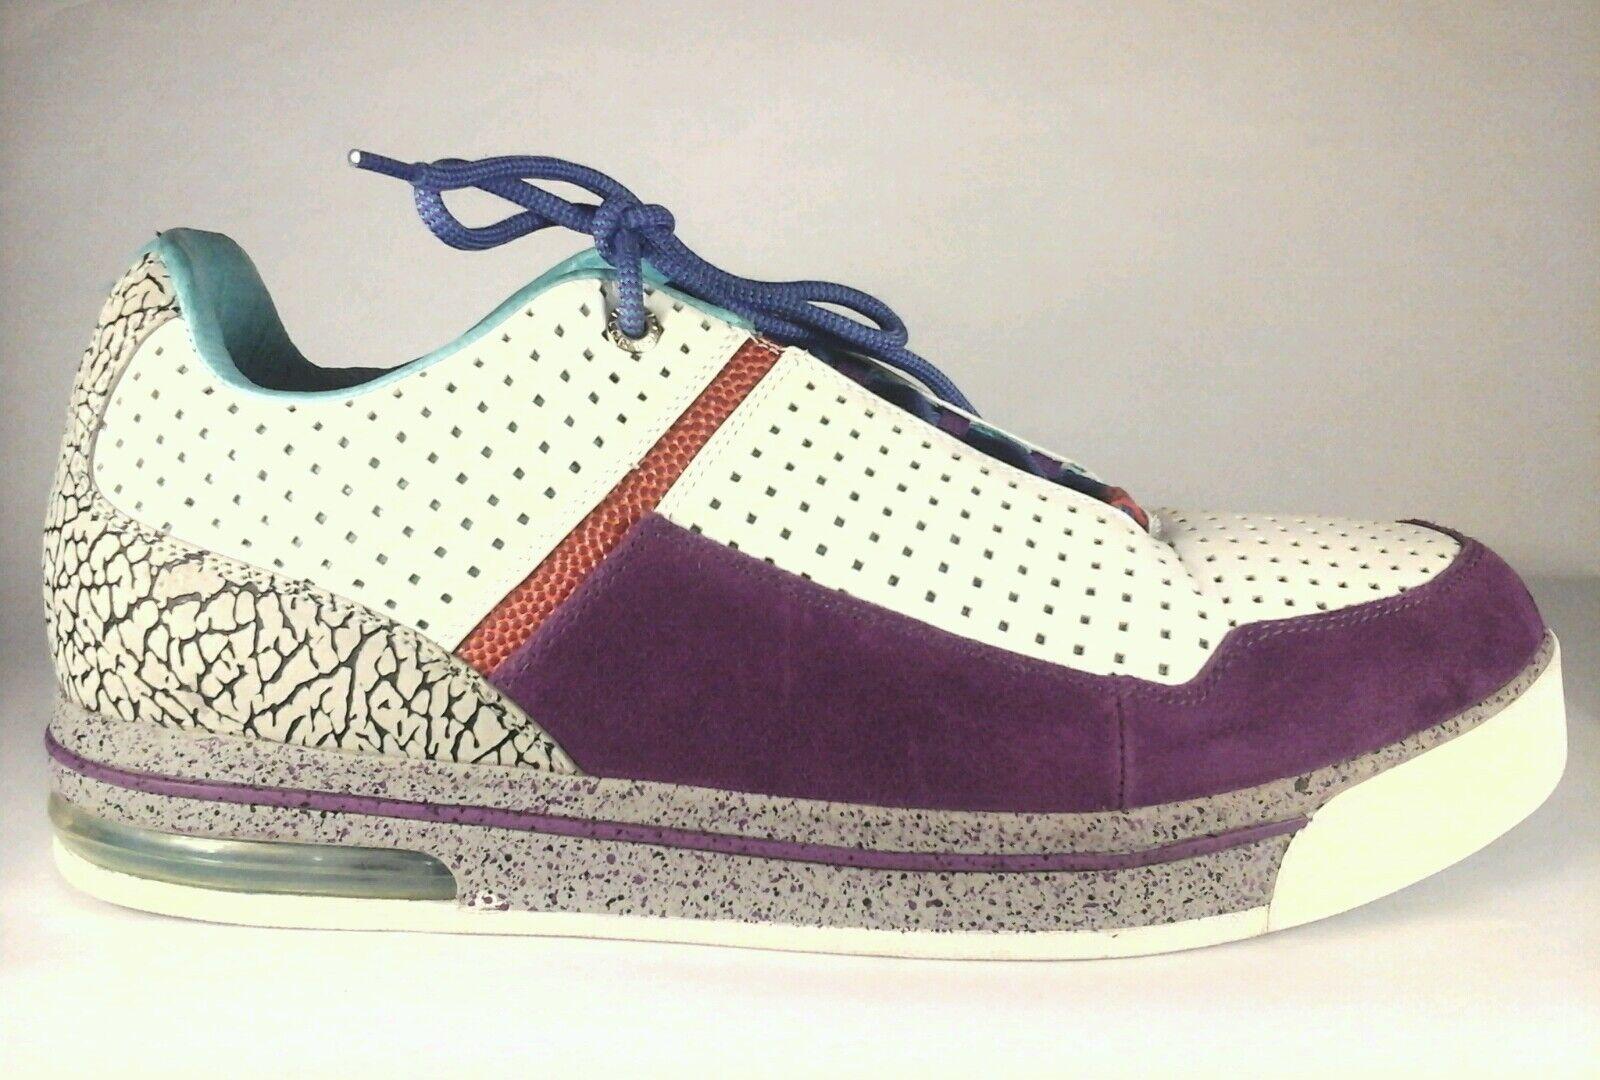 Undr Crwn Sneakers Shoes White Cyan Elephan MENS Sz US 16 RARE